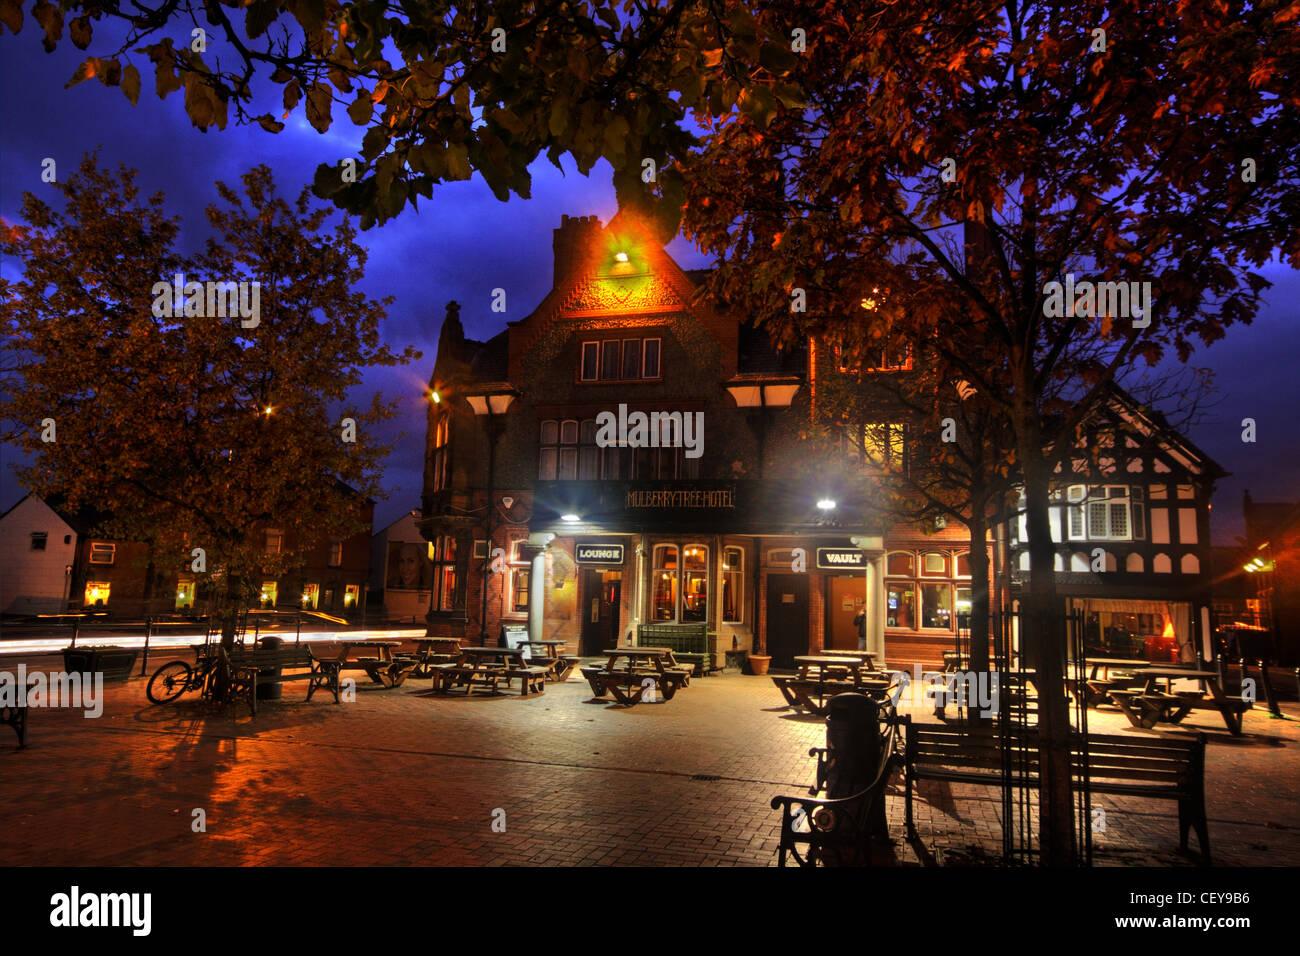 The Mulberry Tree Pub Stockton Heath,South Warrington,Cheshire,UK,at,dusk,Victoria,square,autumn,trees,tree,gotonysmith,historic,pub,public,house,English,village,pub,in,NW,North,West,England,freehouse,free,house,landlord,at,dusk,night,shot,nightshot,gotonysmith,Buy Pictures of,Buy Images Of